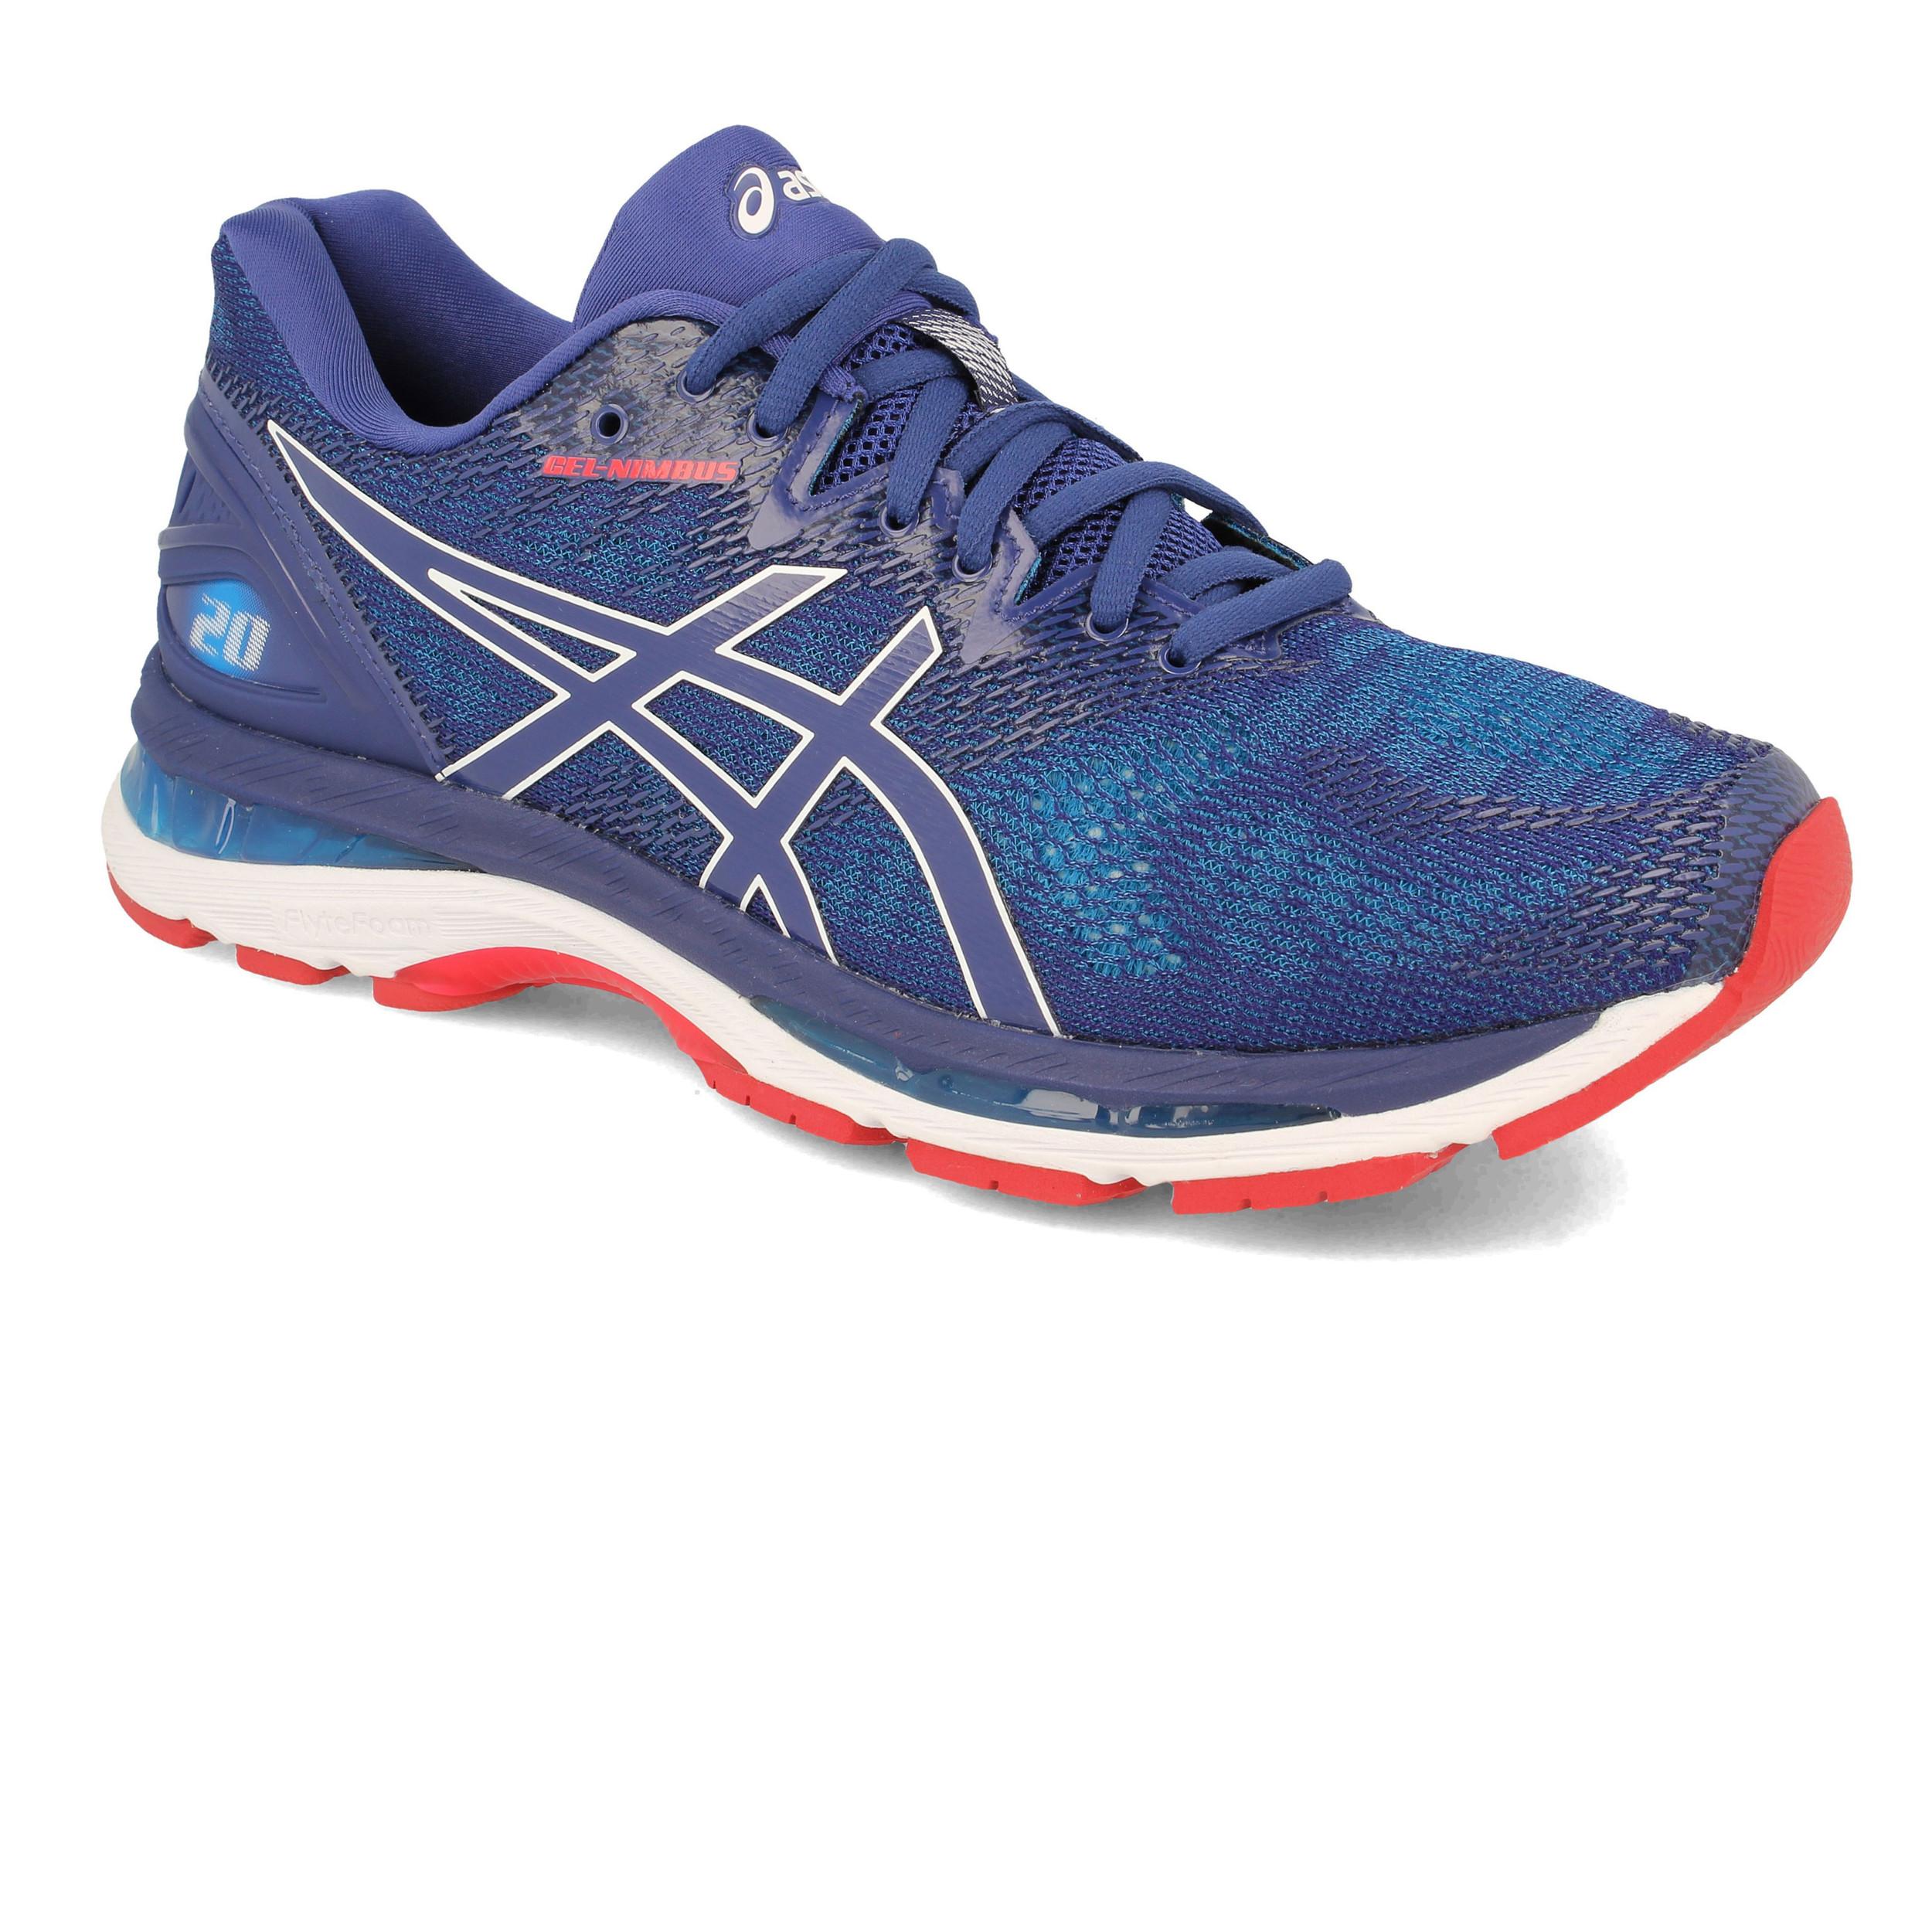 7e0163dd4e0ef Asics Mens Gel-Nimbus 20 Running Shoes Trainers Sneakers Black Navy ...